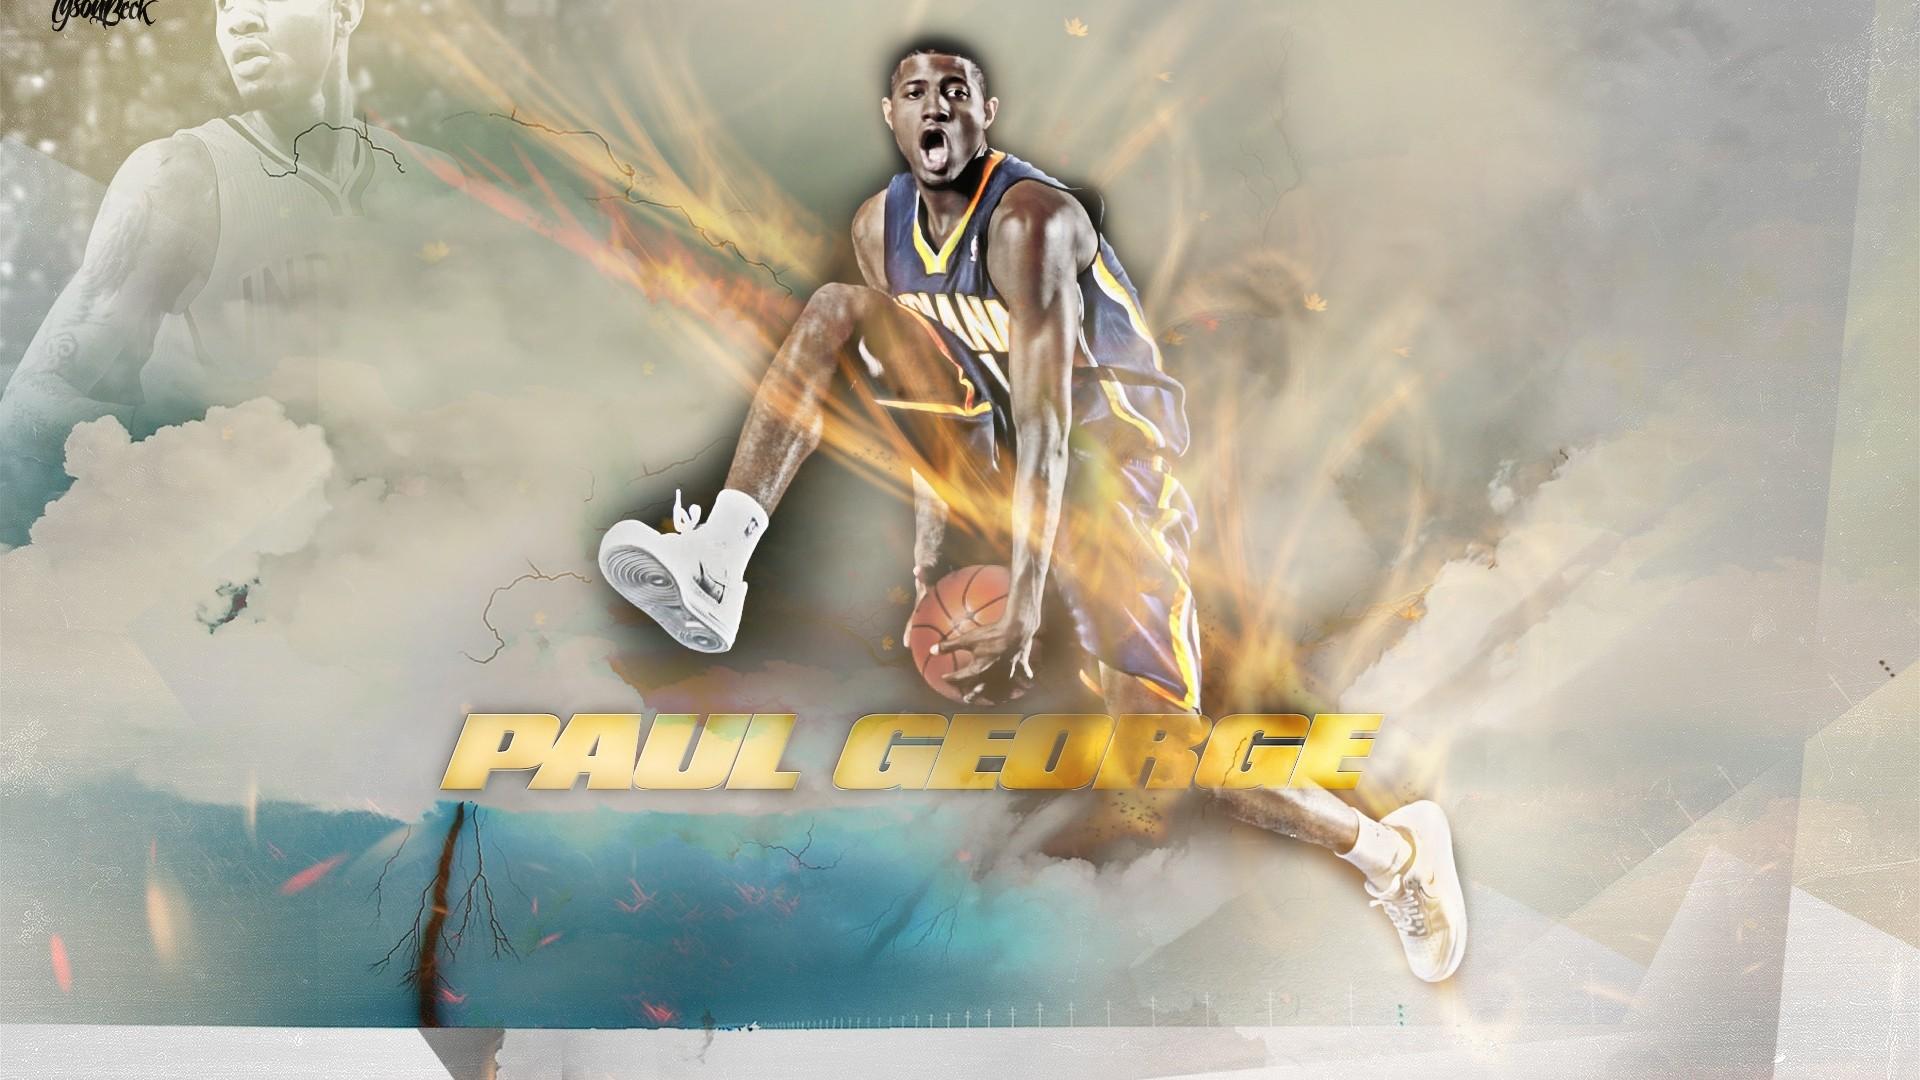 Paul George Pic